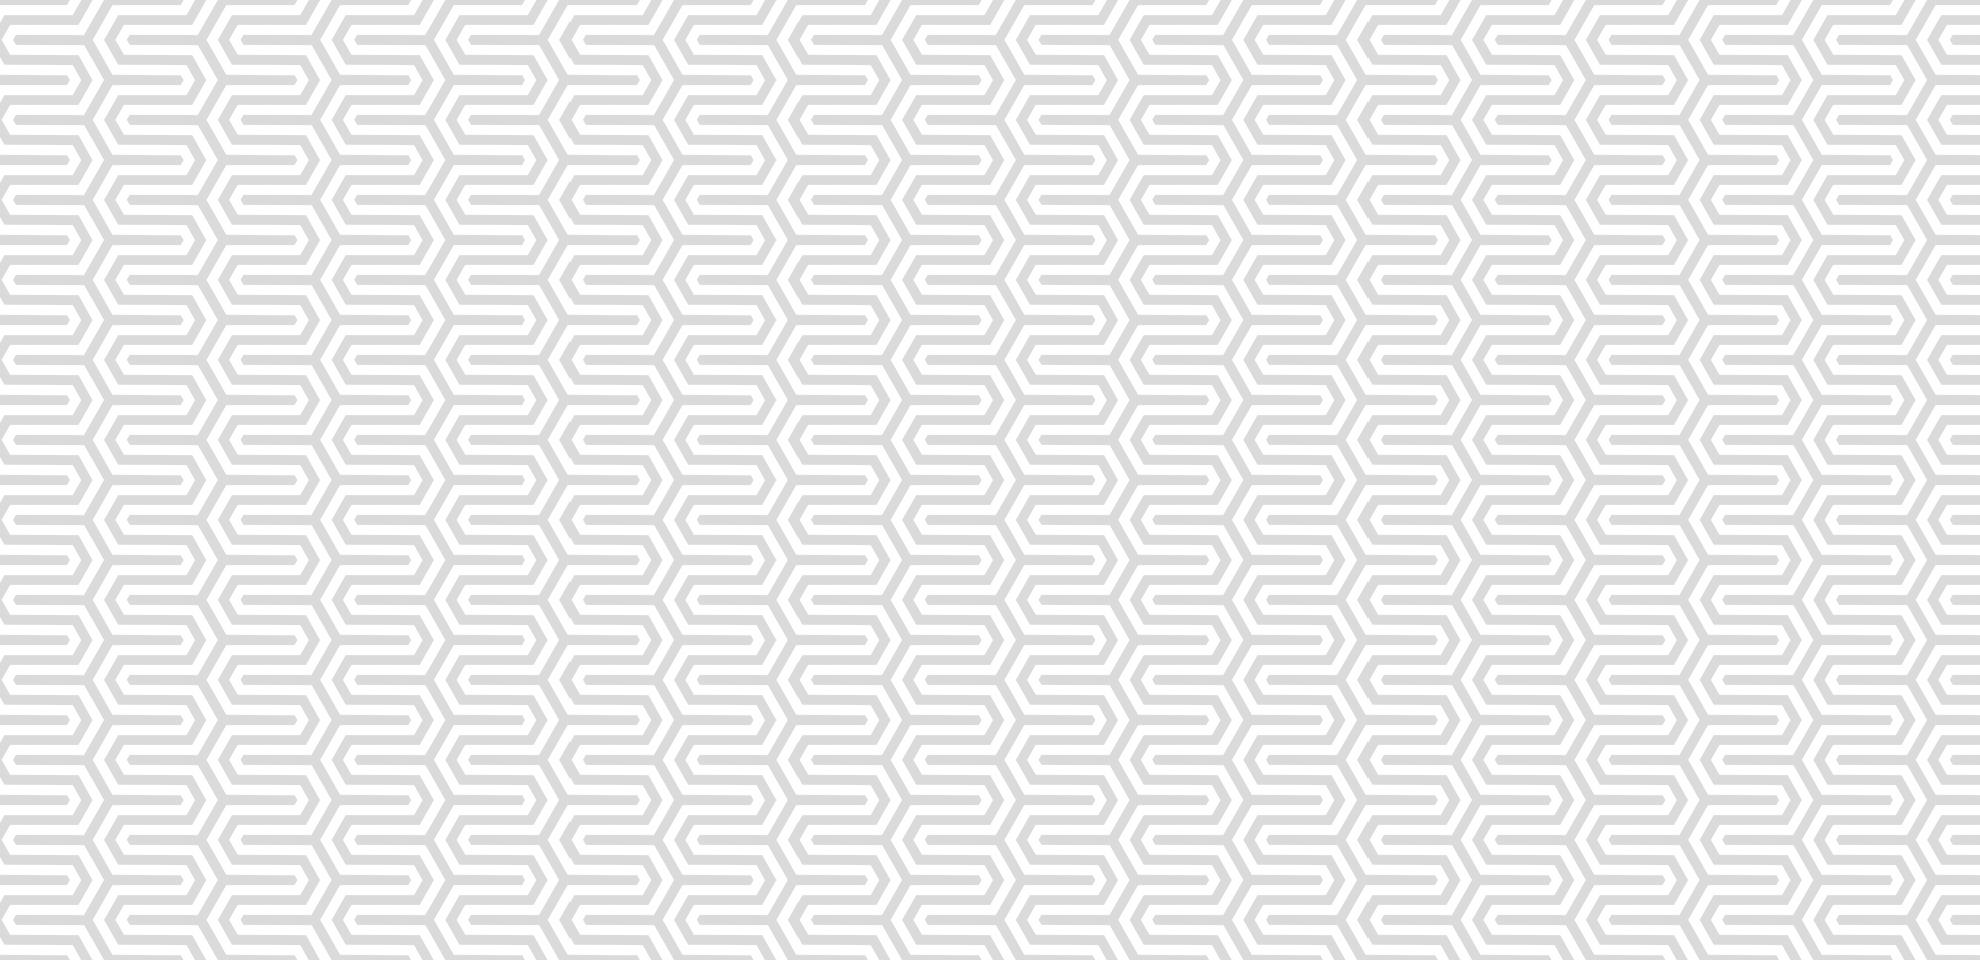 bg_textura01.jpg